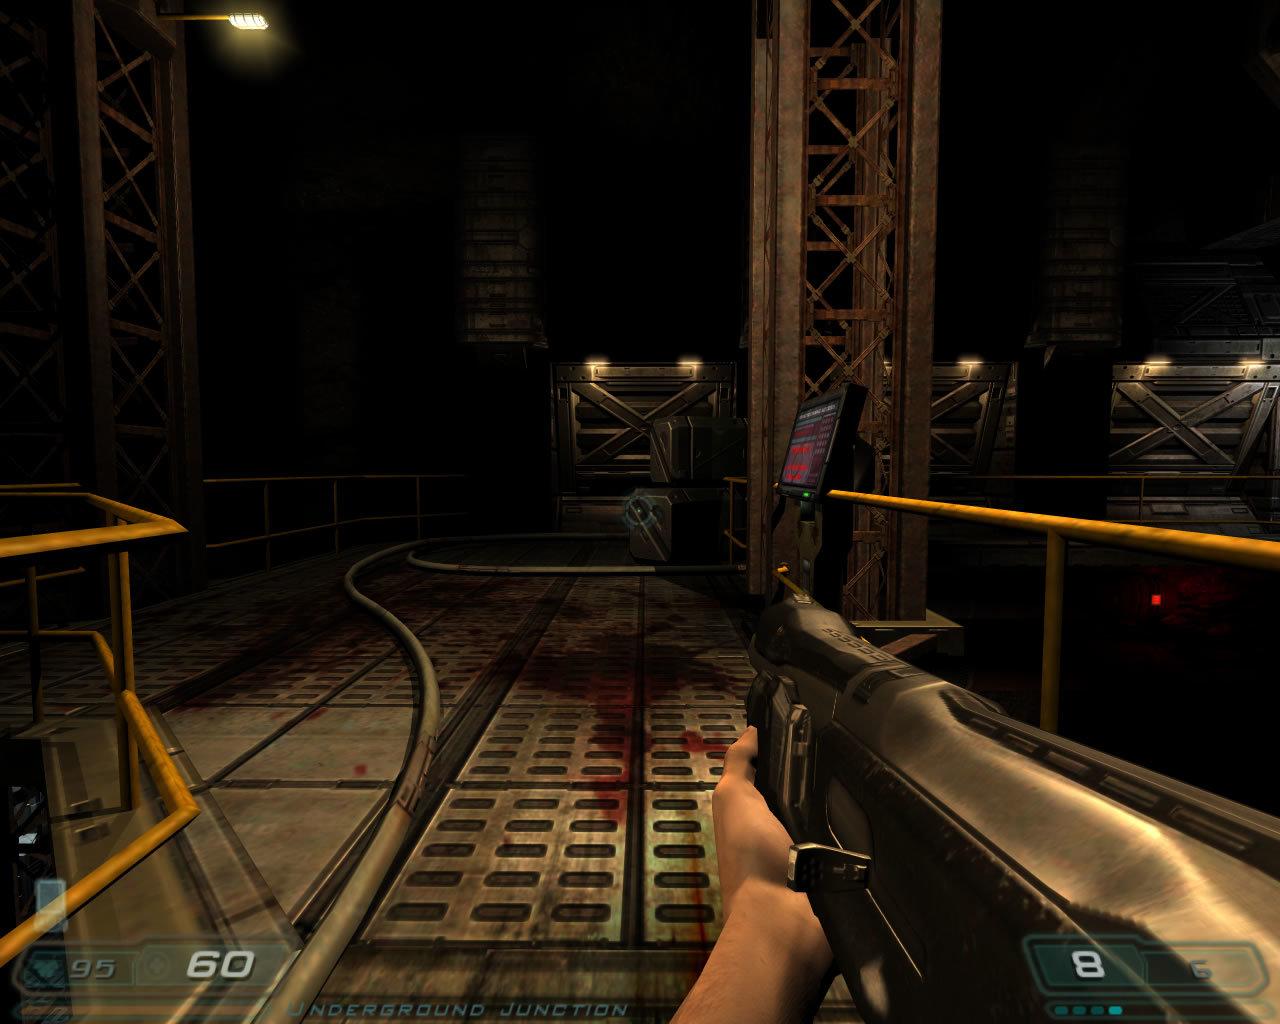 Doom 3 High Quality w/ 8x AA